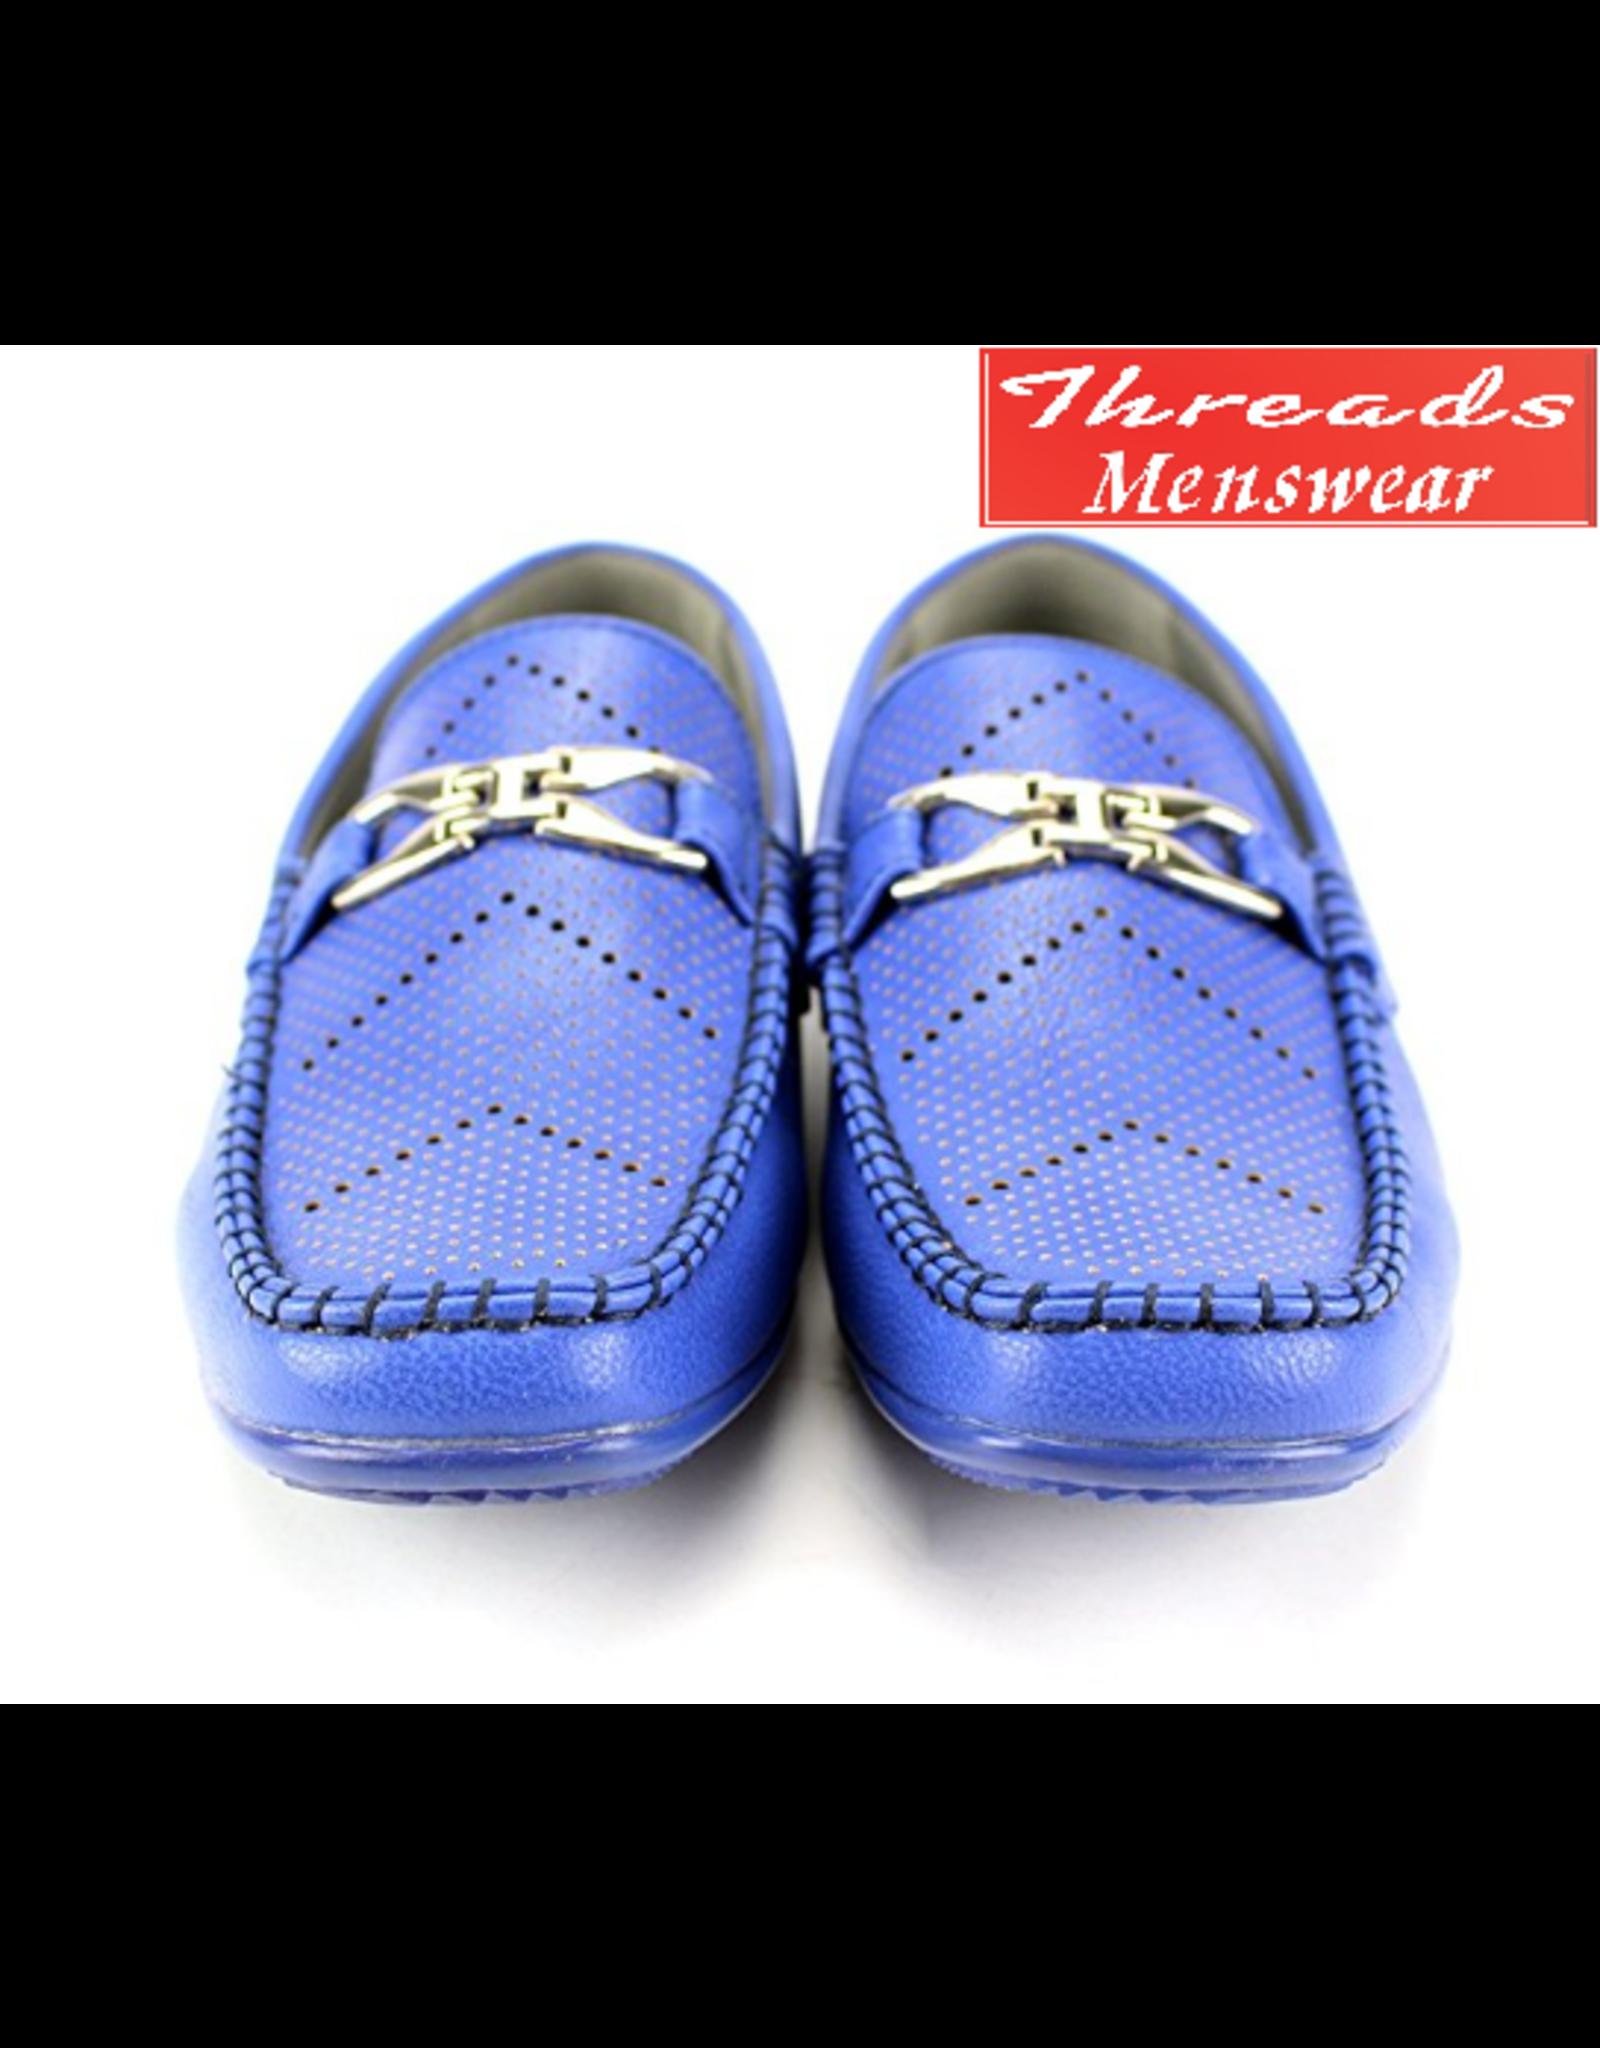 AC Casual AC Casuals 6747 Shoe - Royal Blue